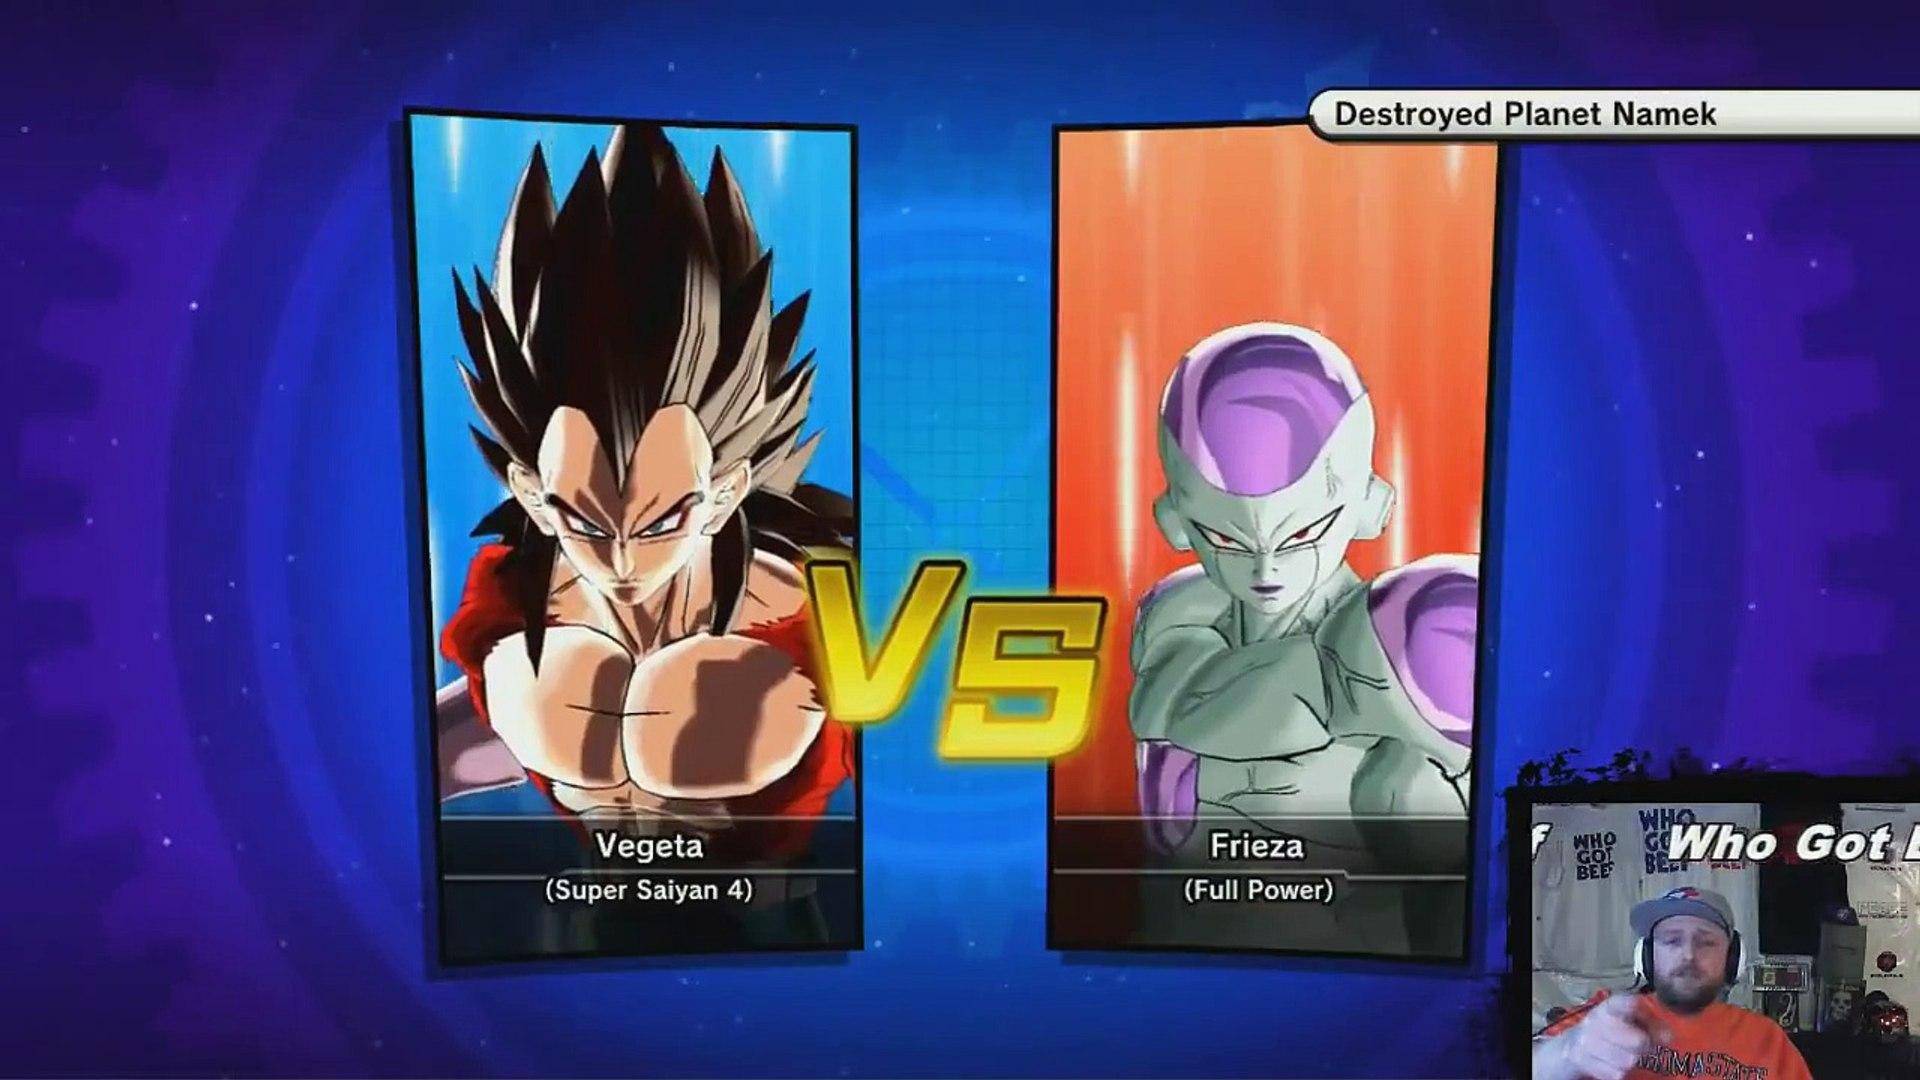 Vegeta Super Saiyan 4 Vs Frieza Full Power Full Fight Dragon Ball Xenoverse Gameplay Xbox One Dbz